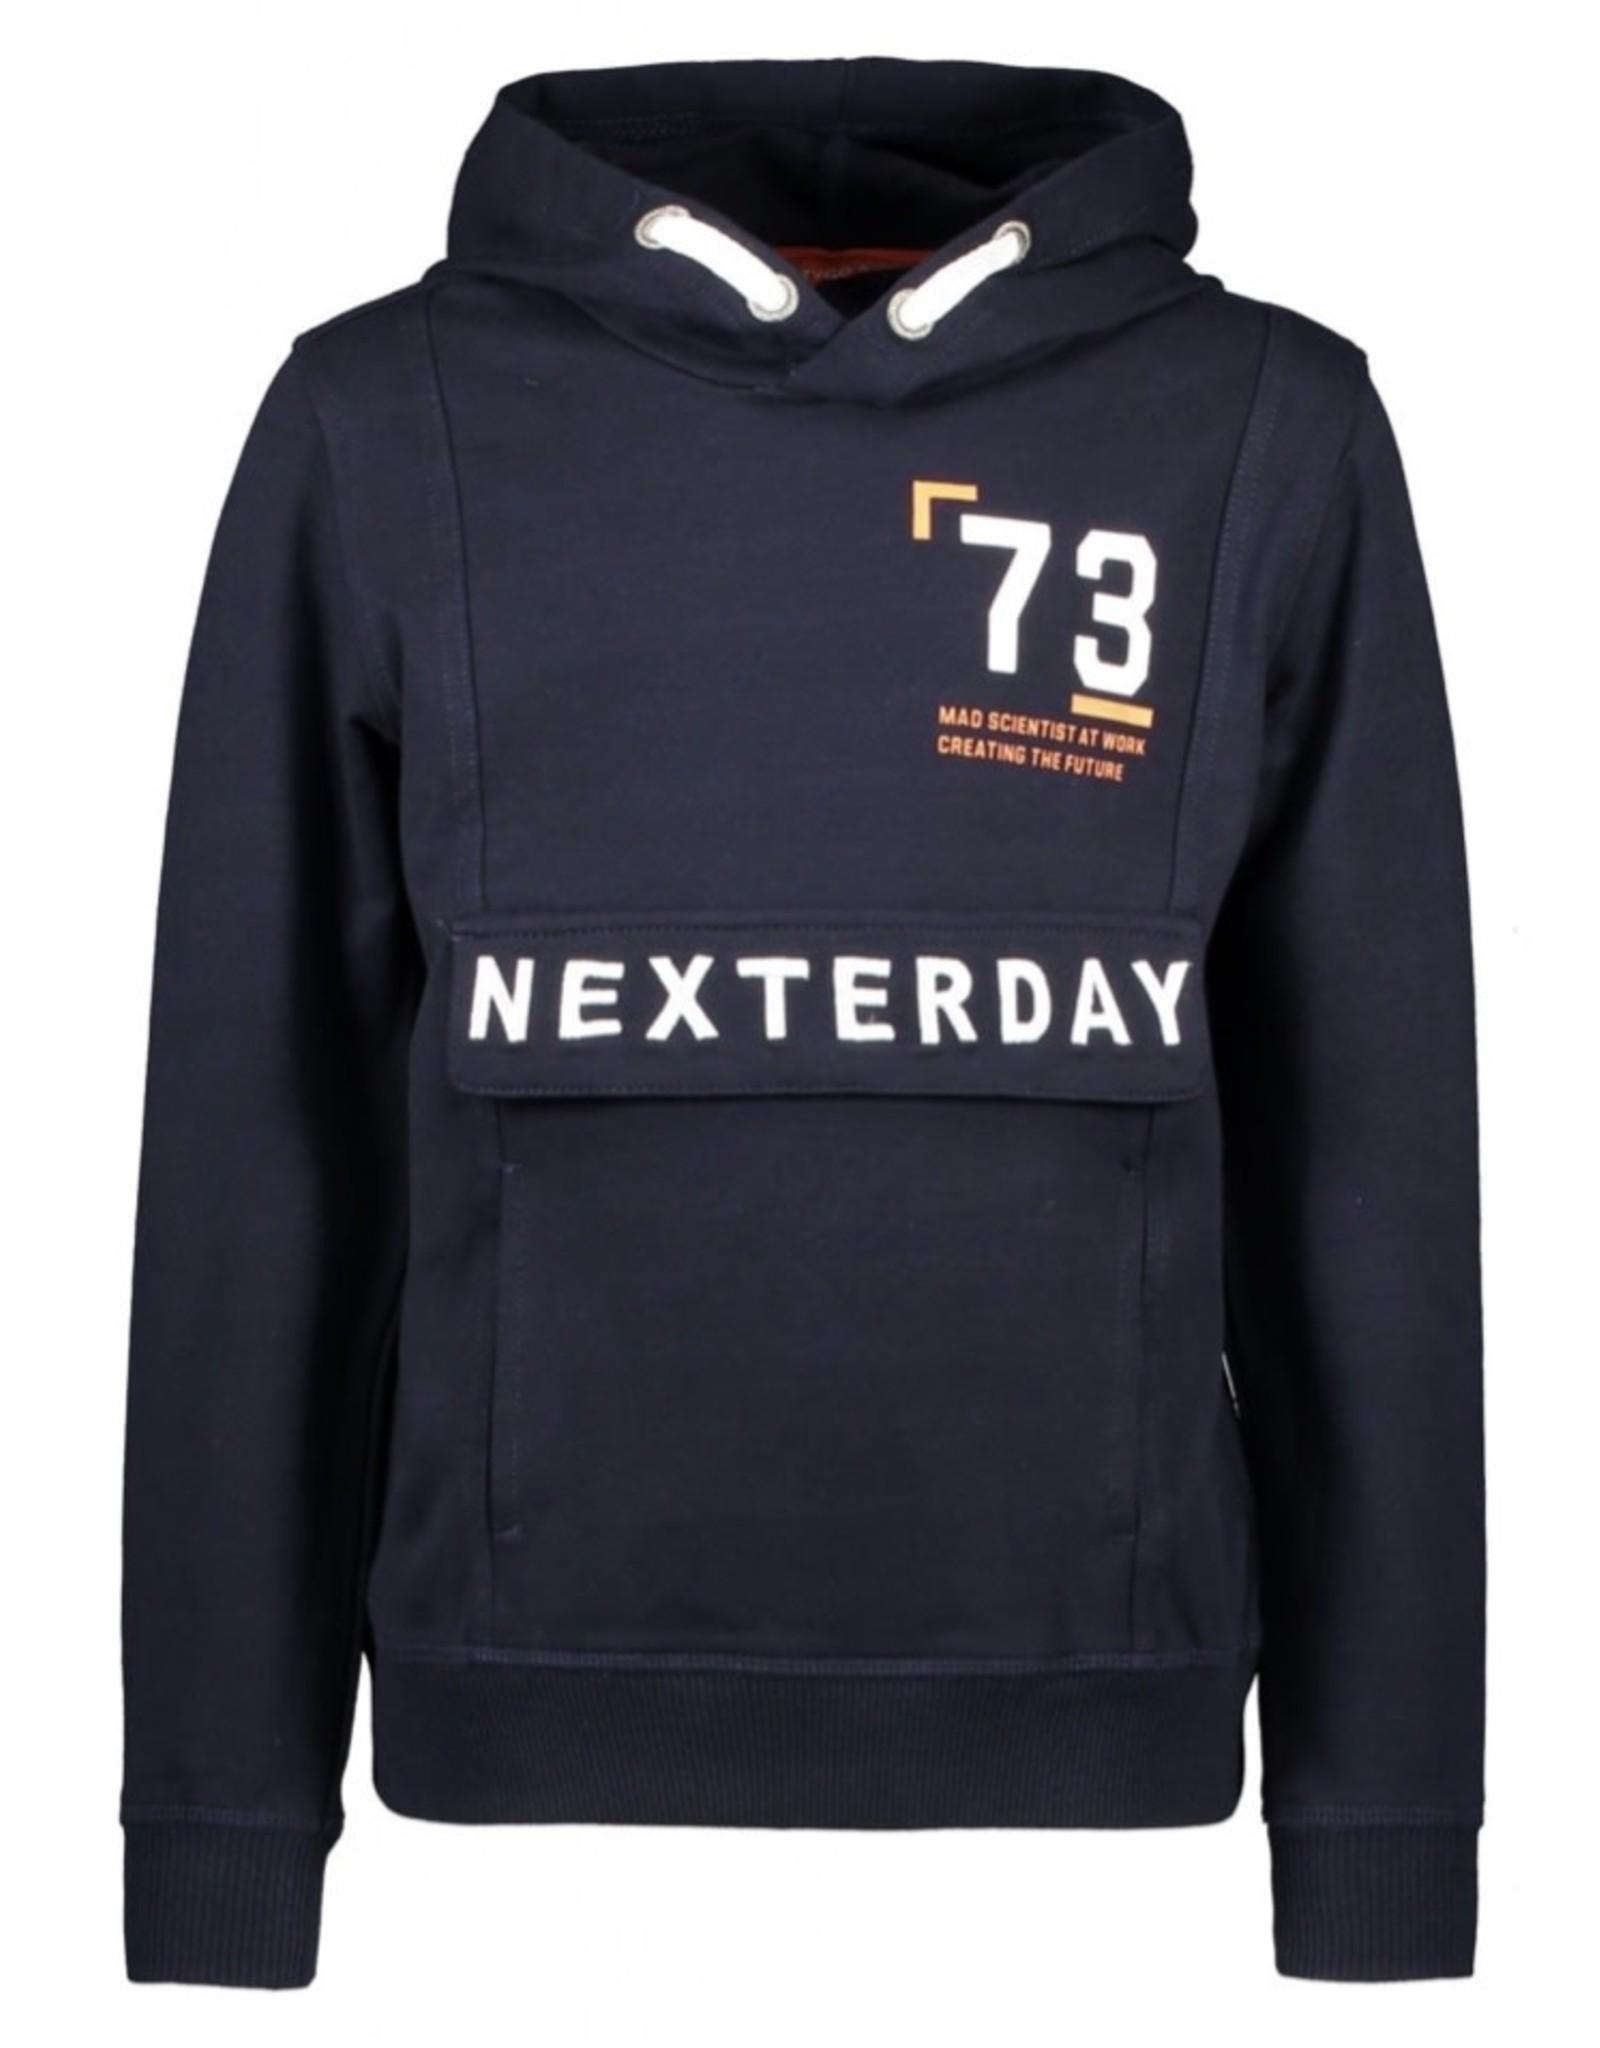 Tygo & vito X009-6341  Sweater